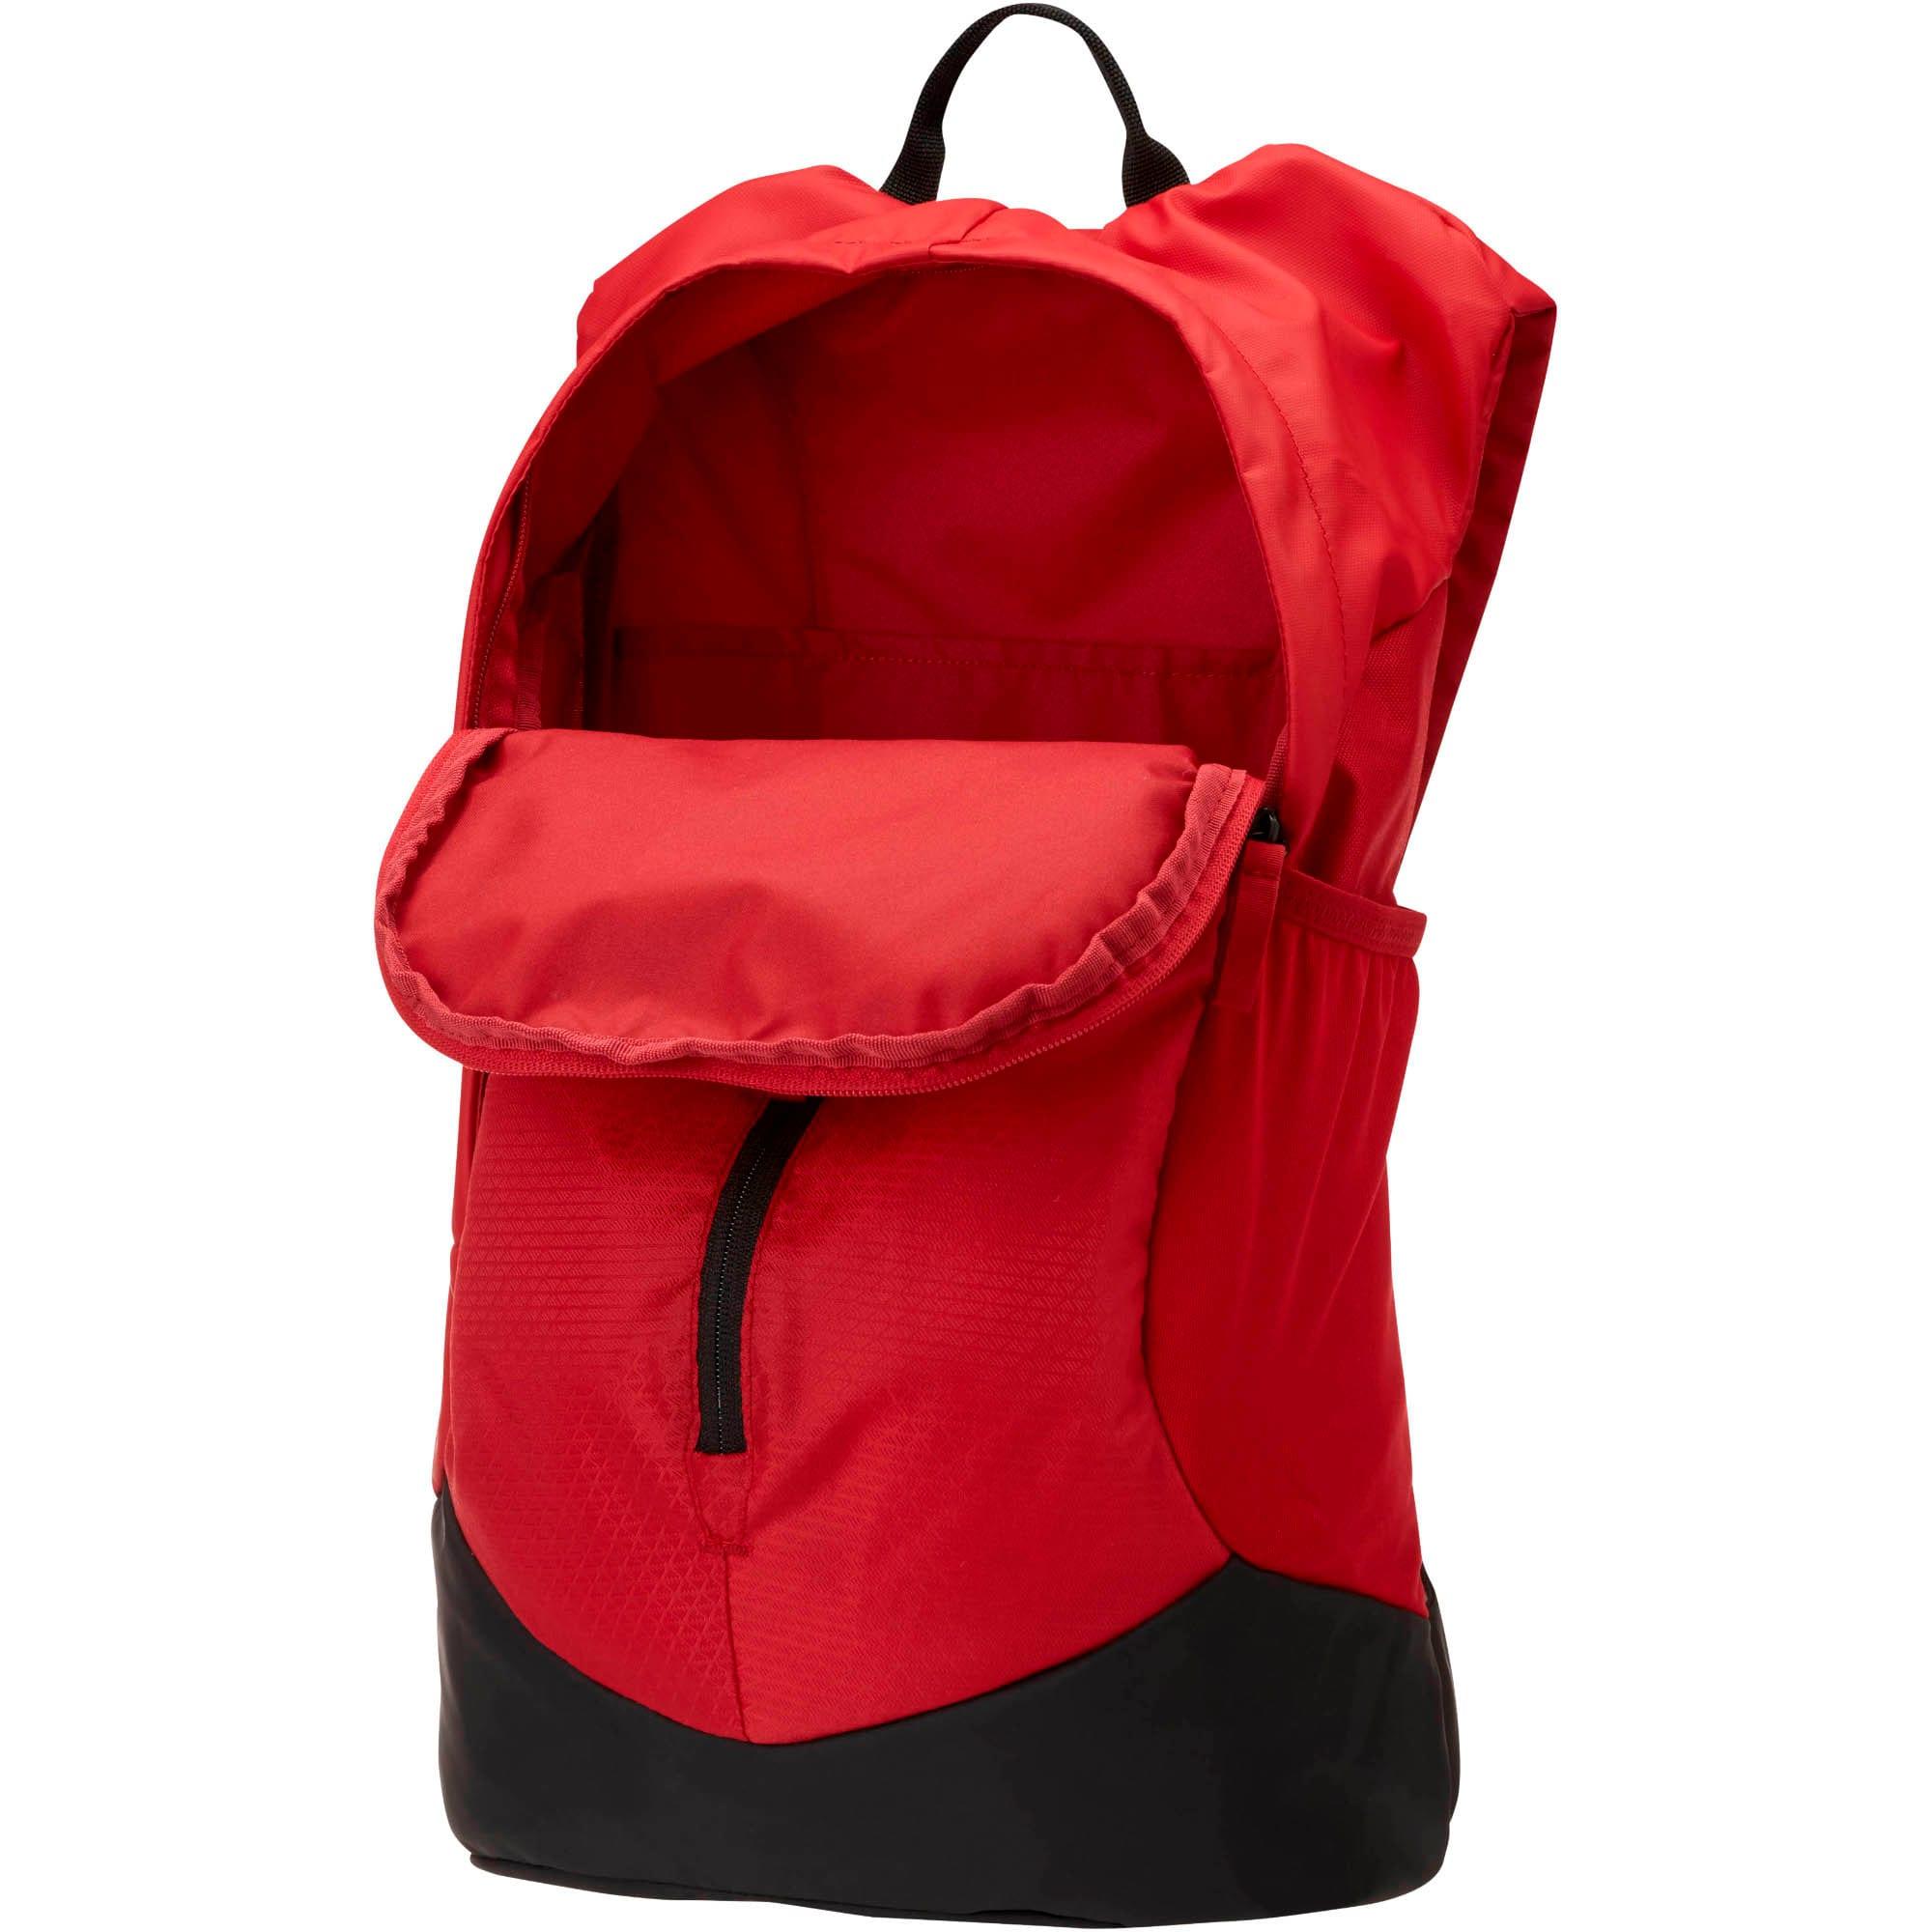 Thumbnail 2 of Arsenal Performance Backpack, Chili Pepper-Red-Black, medium